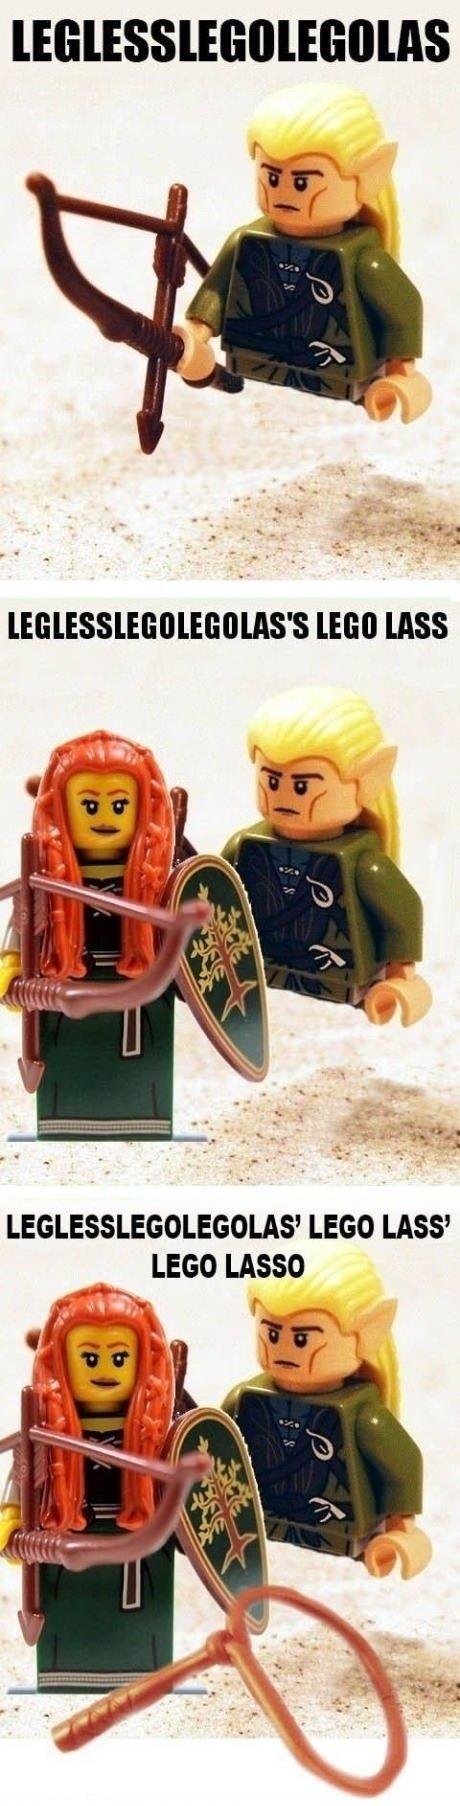 It goes deeper. . LEGLESSLEGOLEGOLAS' LEGO USS' LEGO LAMO. also. LEGLESSLEGOLEGOLAS'S LEGO LASS' LEGO LASSO LASSOS LEGLESSLEGOLEGOLAS' LEGO ASS